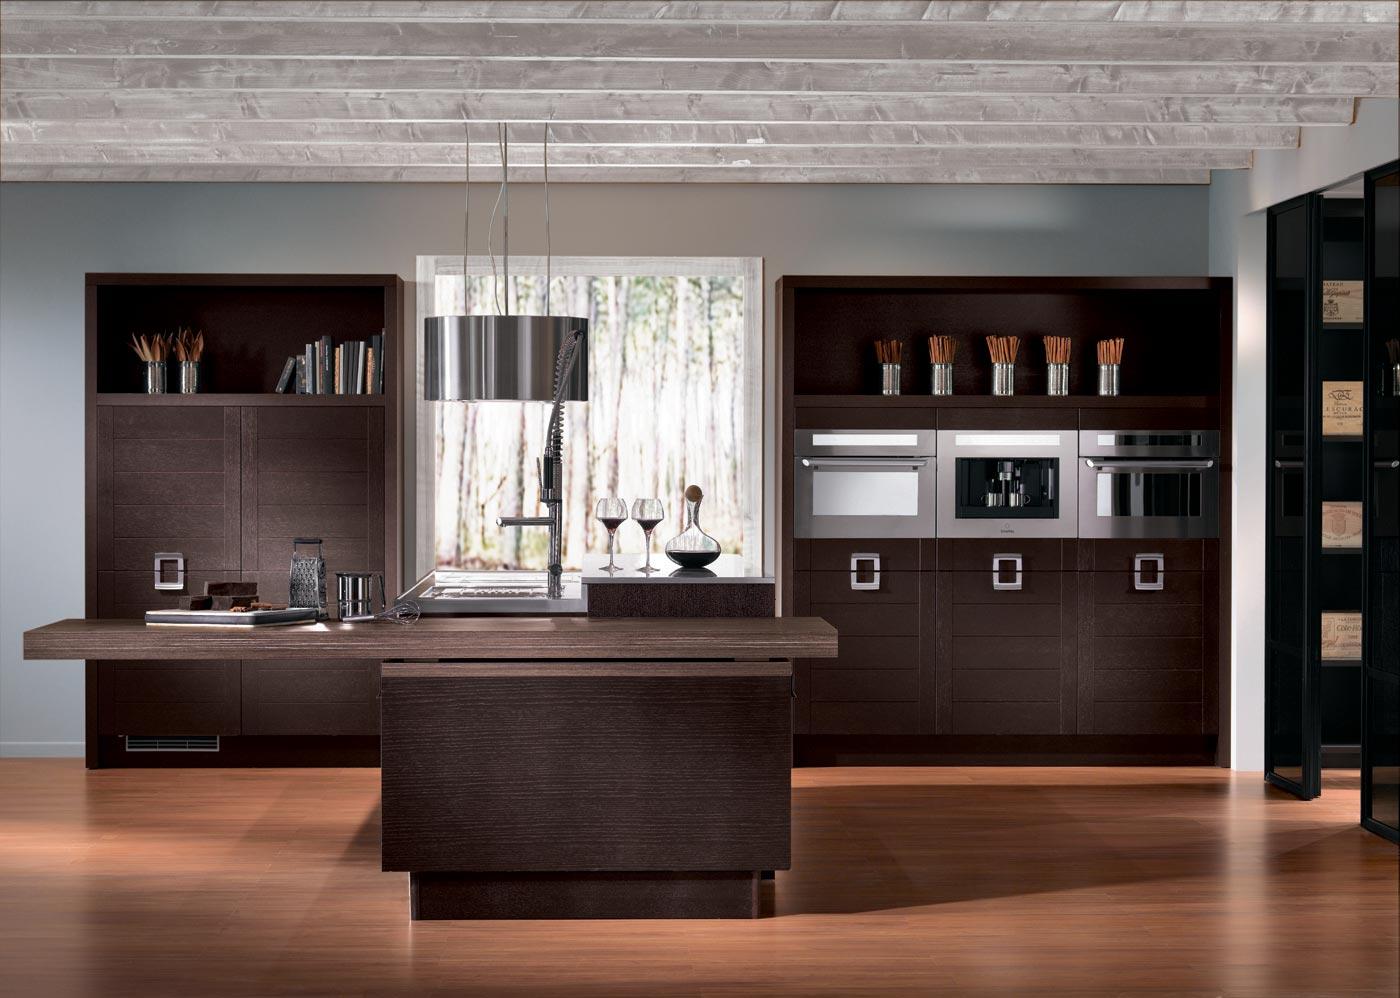 cuisine elegance ch ne acajou perene lyon. Black Bedroom Furniture Sets. Home Design Ideas